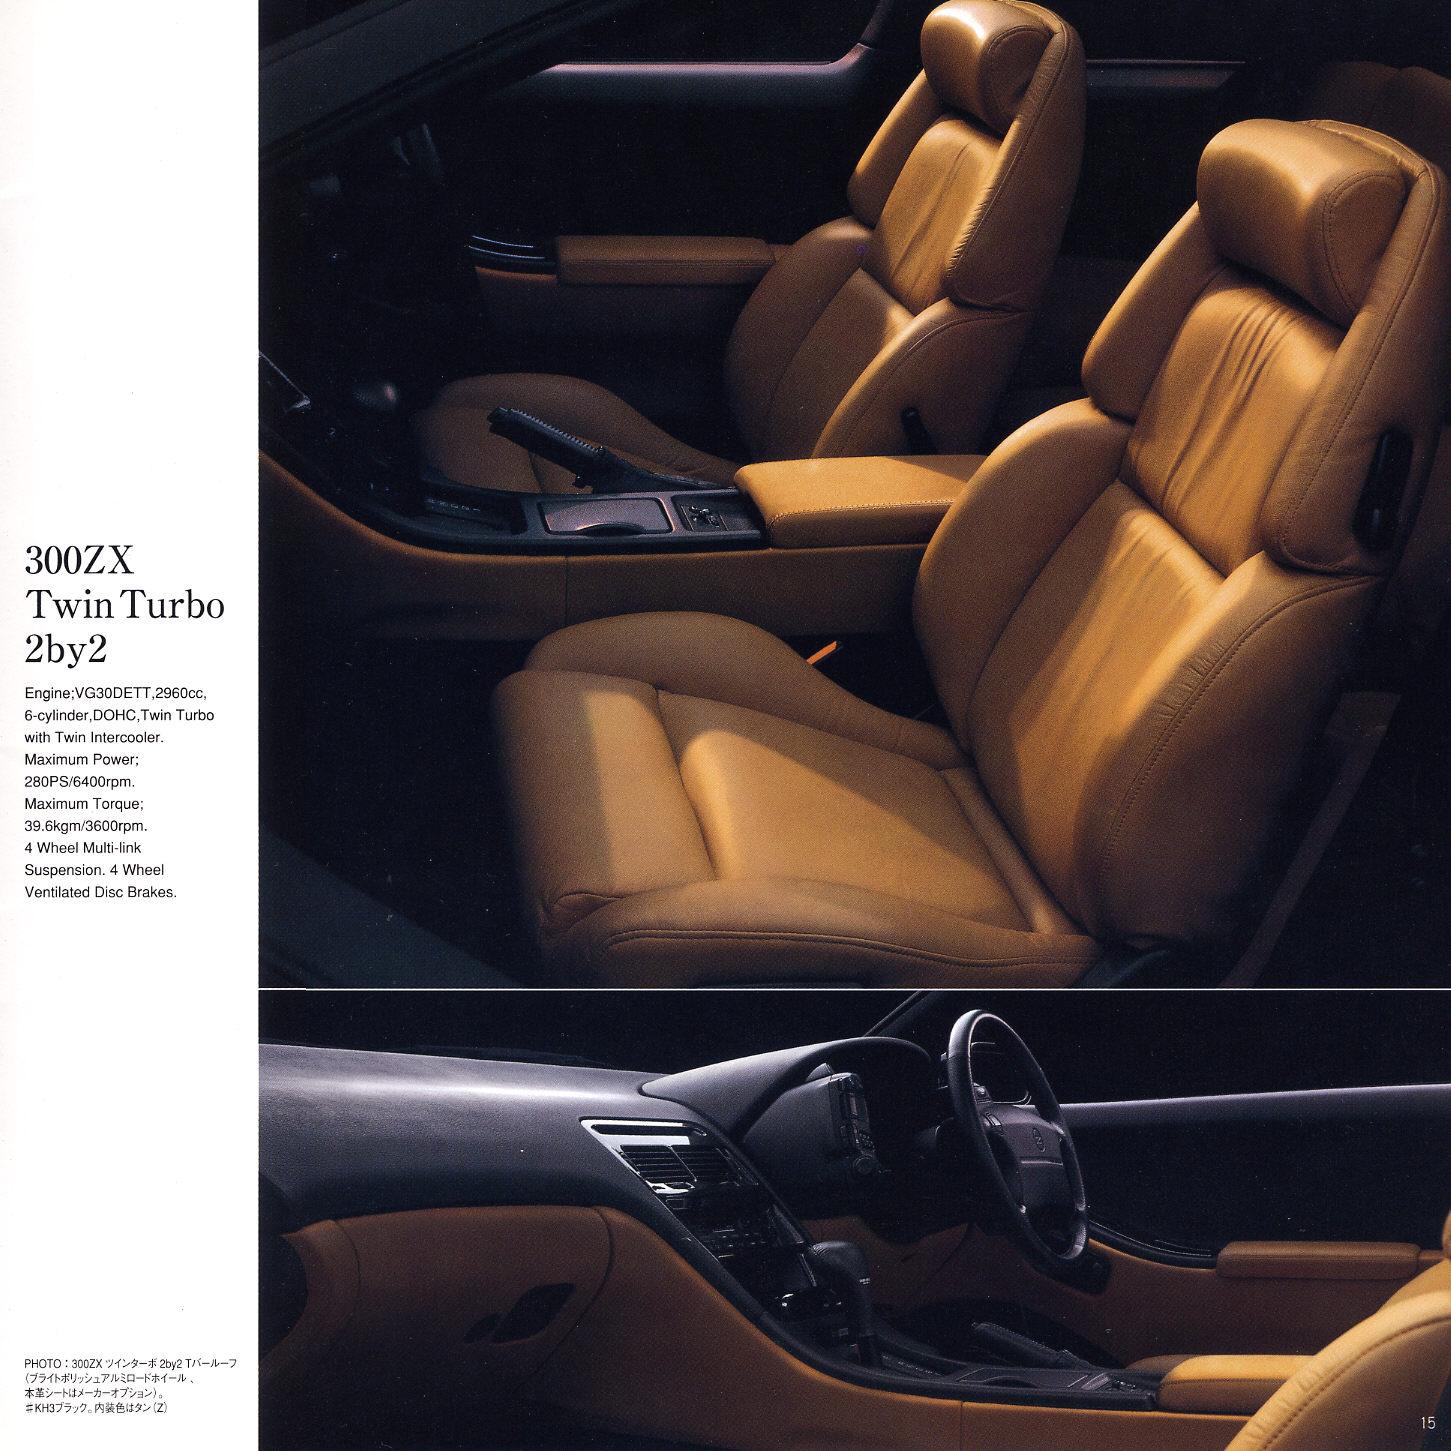 Fairlady Z Tan Leather